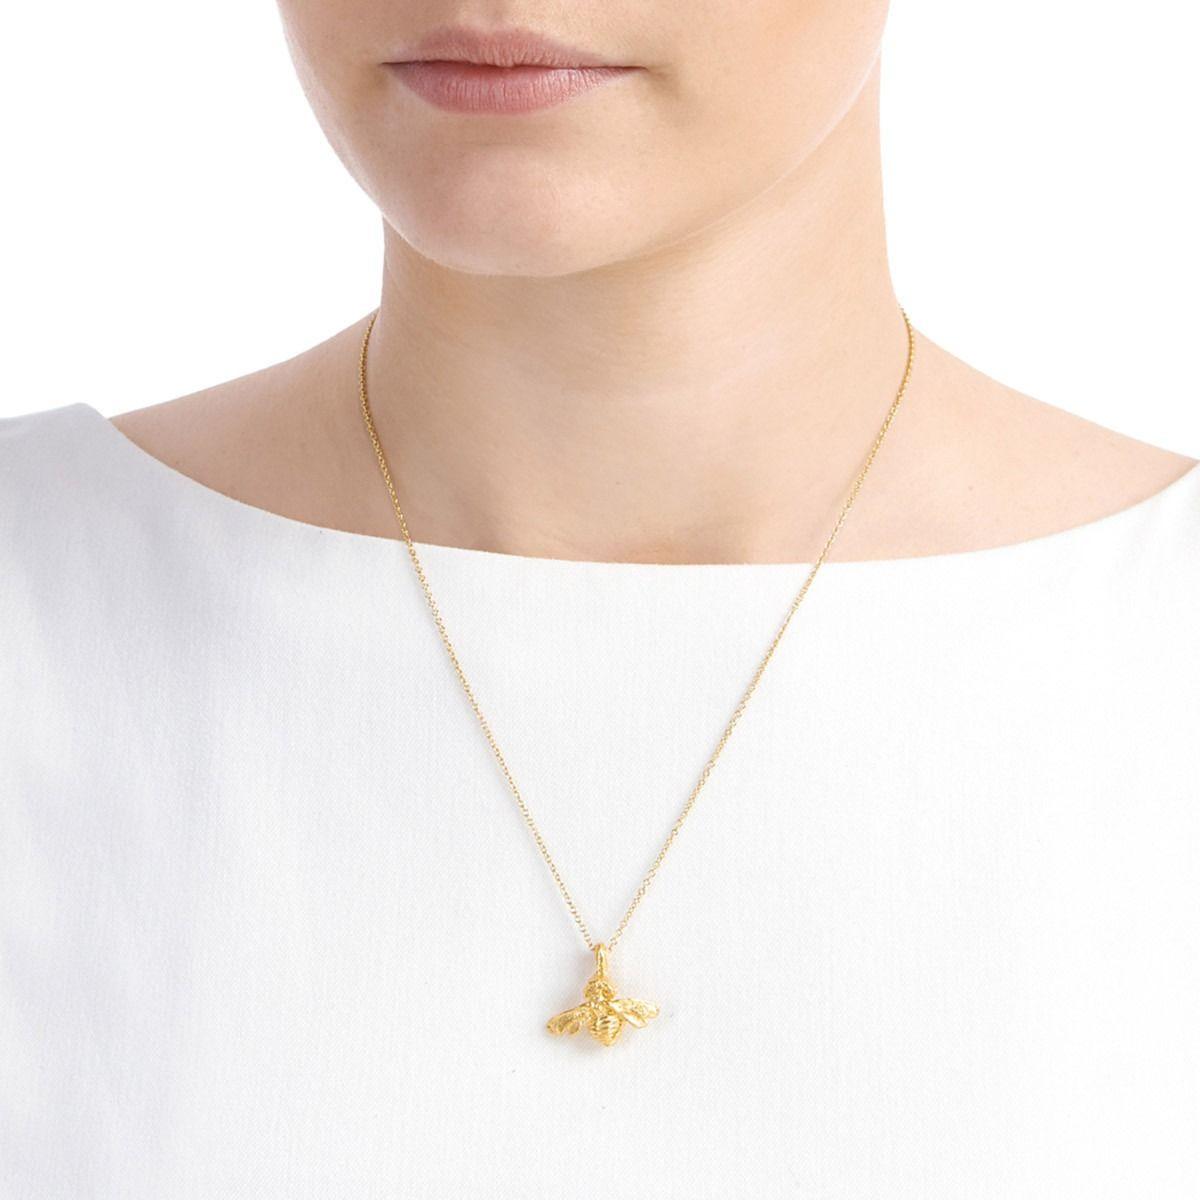 Deborah Blyth Jewellery Gold Bumble Bee Necklace qJ1bNzyjo